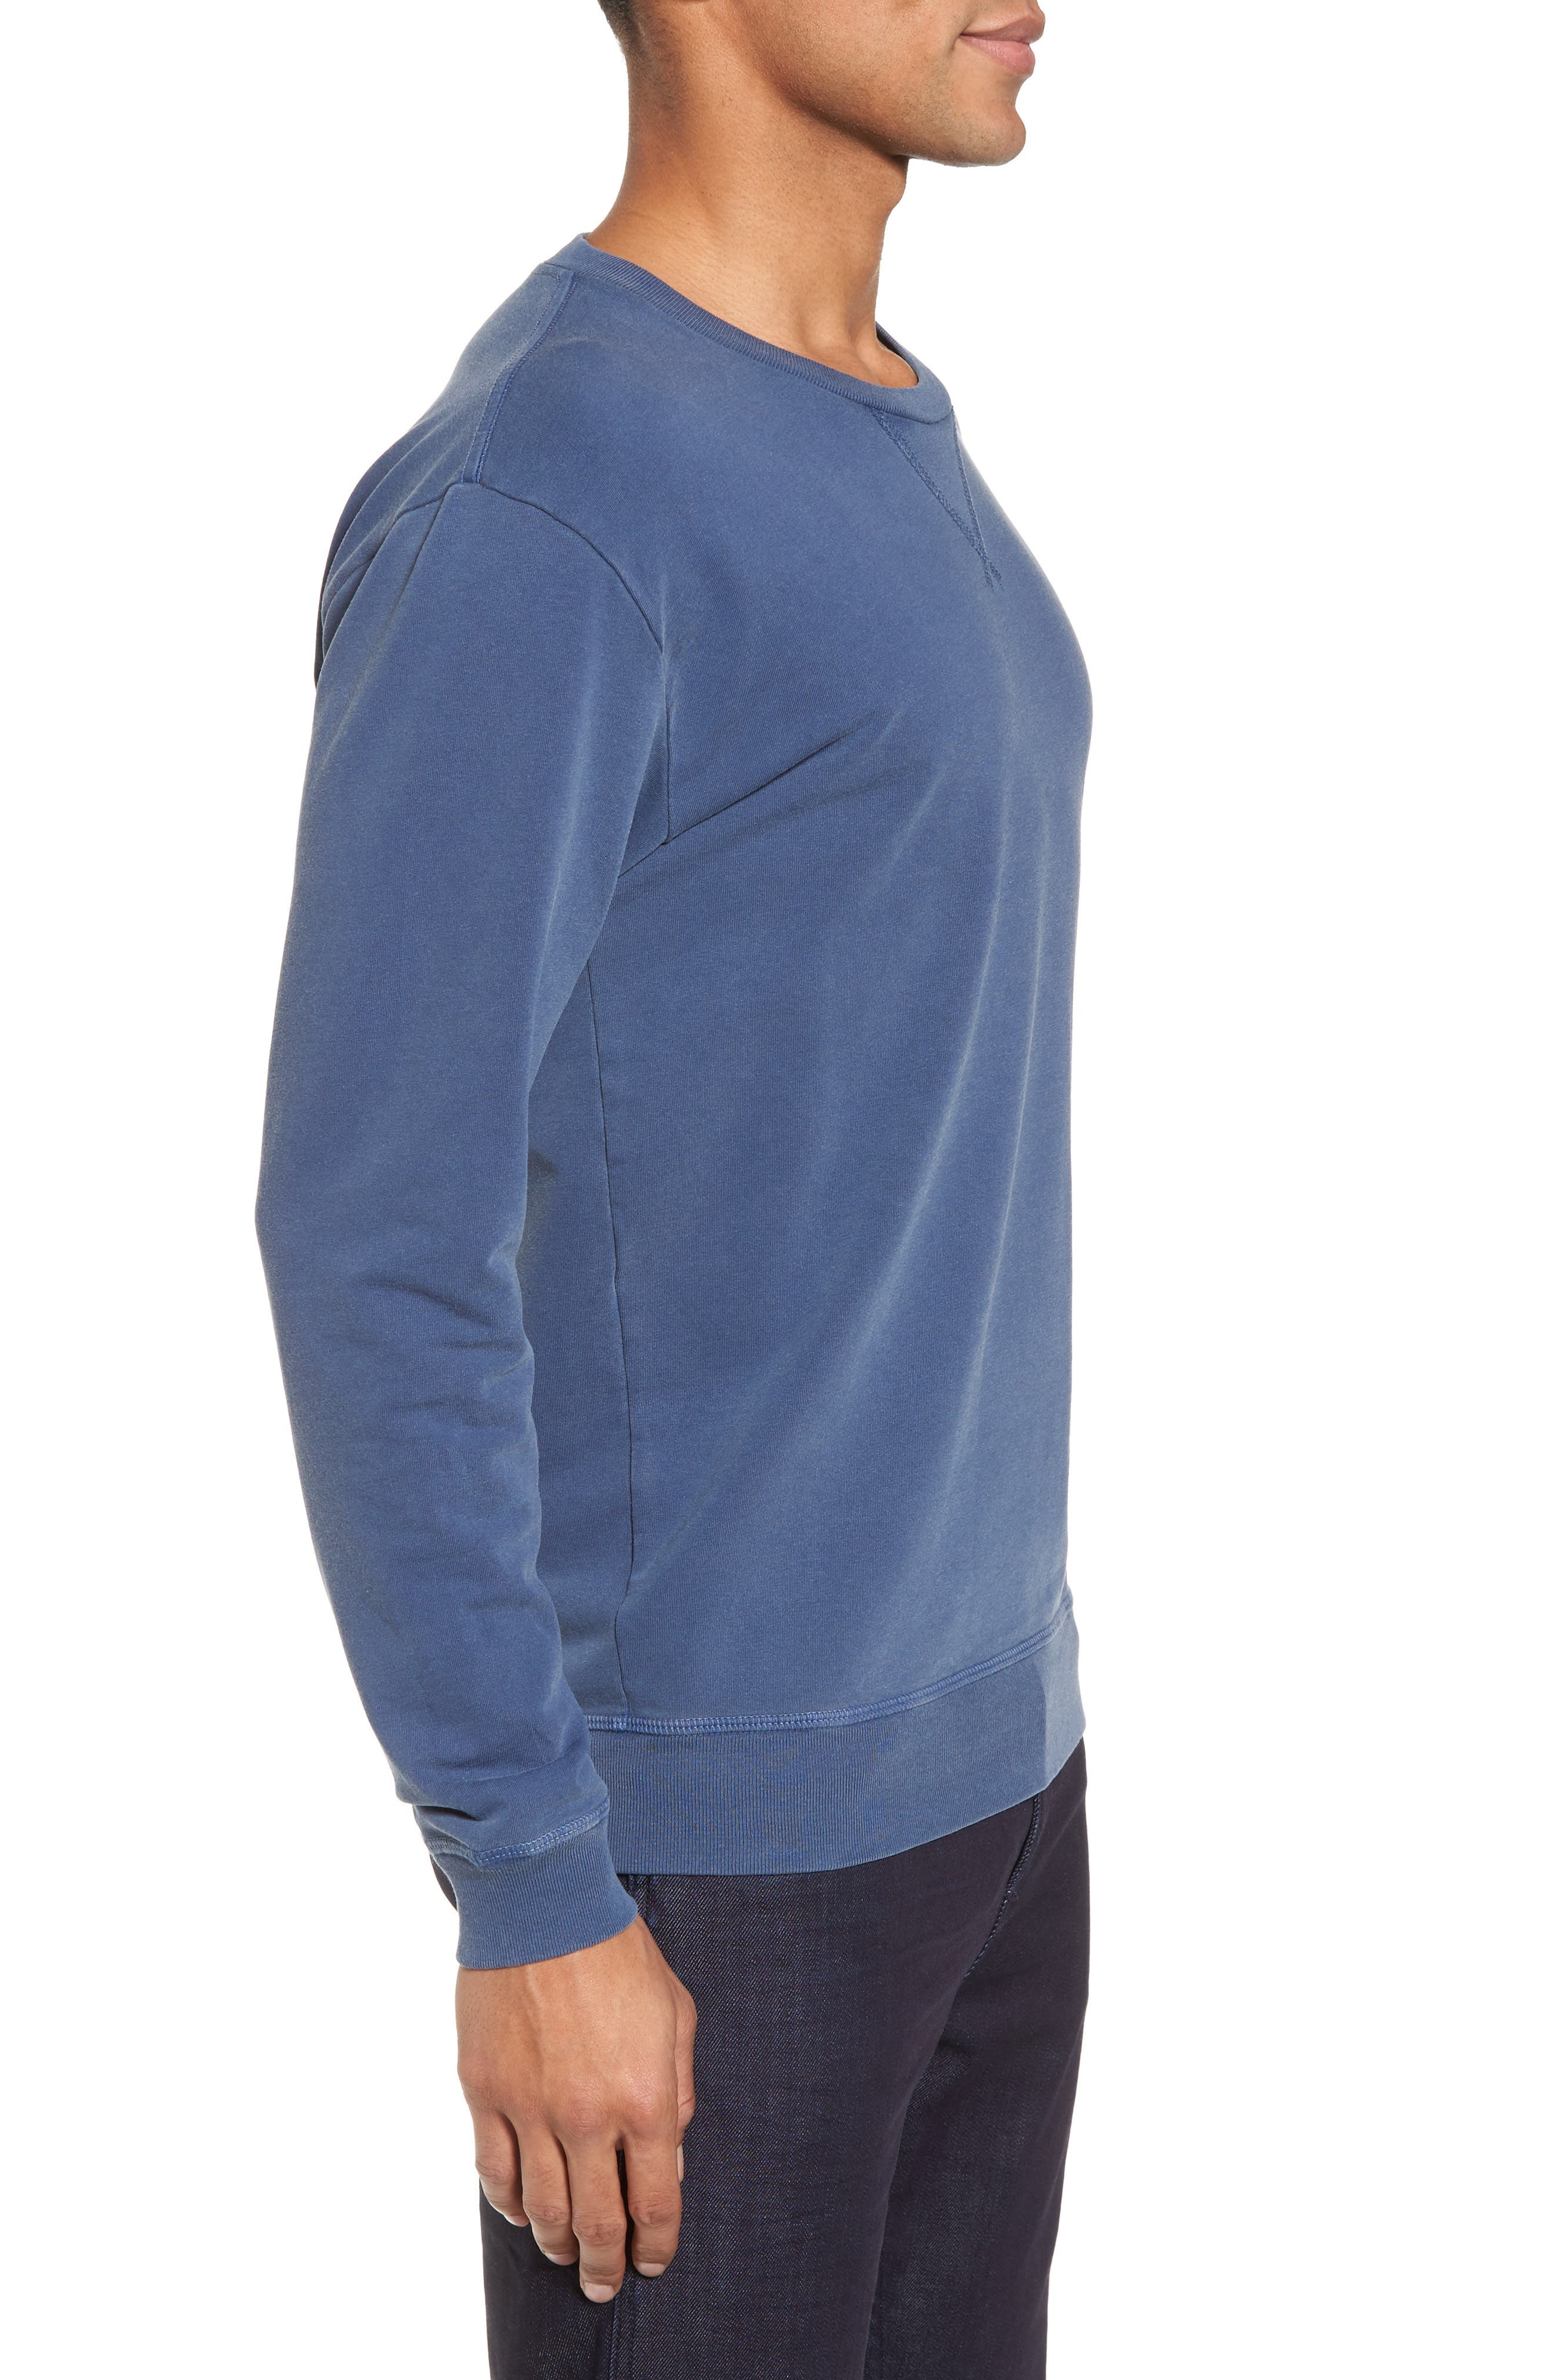 GOODLIFE, Slim Fit Crewneck Sweatshirt, Alternate thumbnail 3, color, FADED NAVY